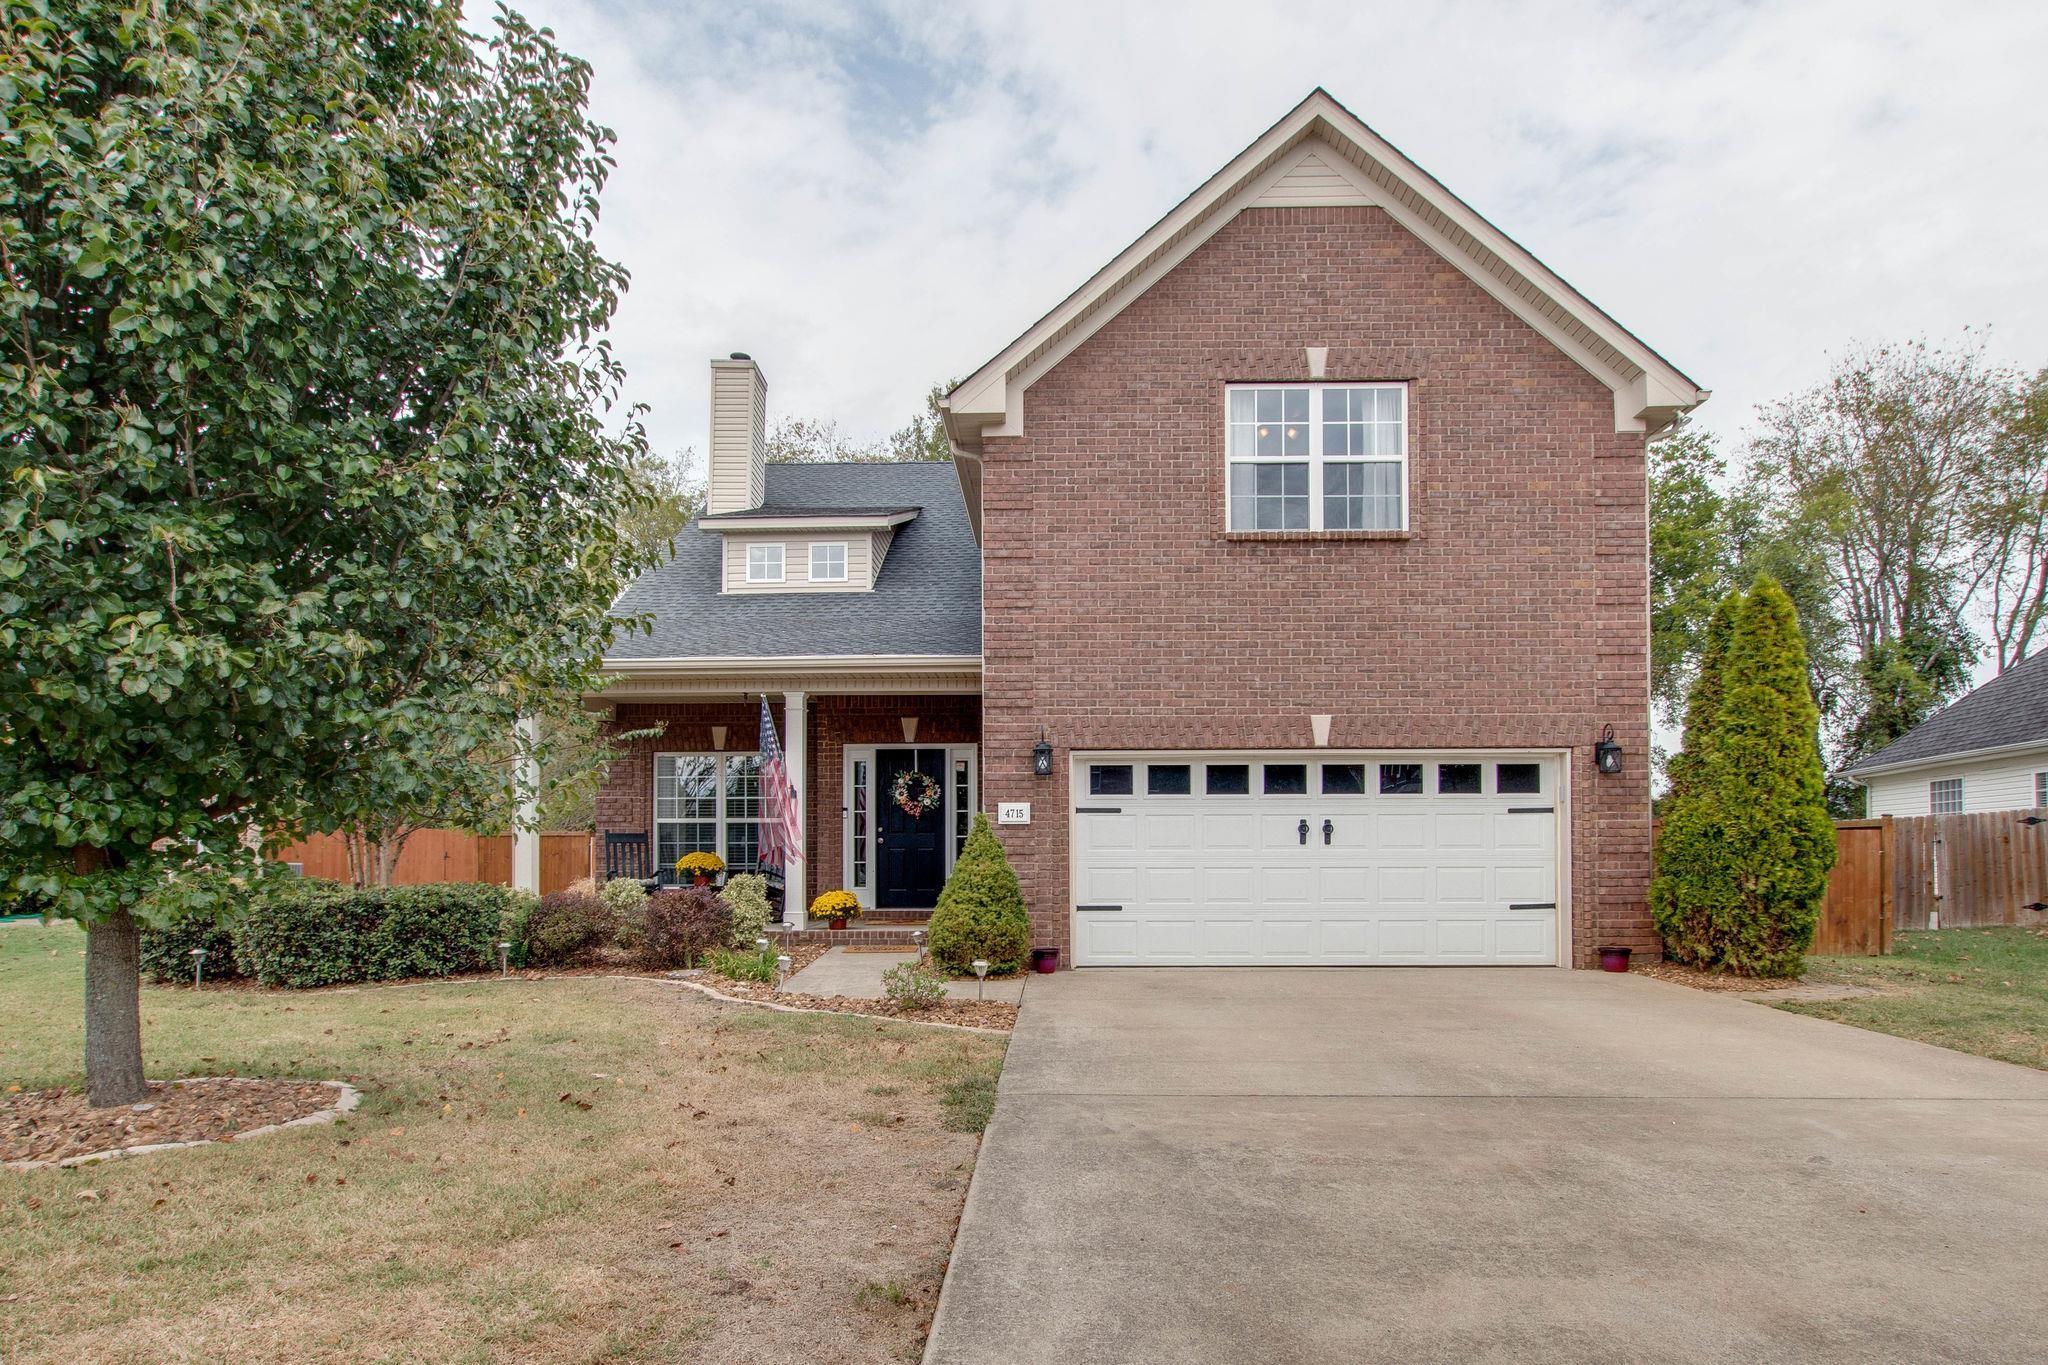 4715 Scottish Dr, Murfreesboro, TN 37128 - Murfreesboro, TN real estate listing